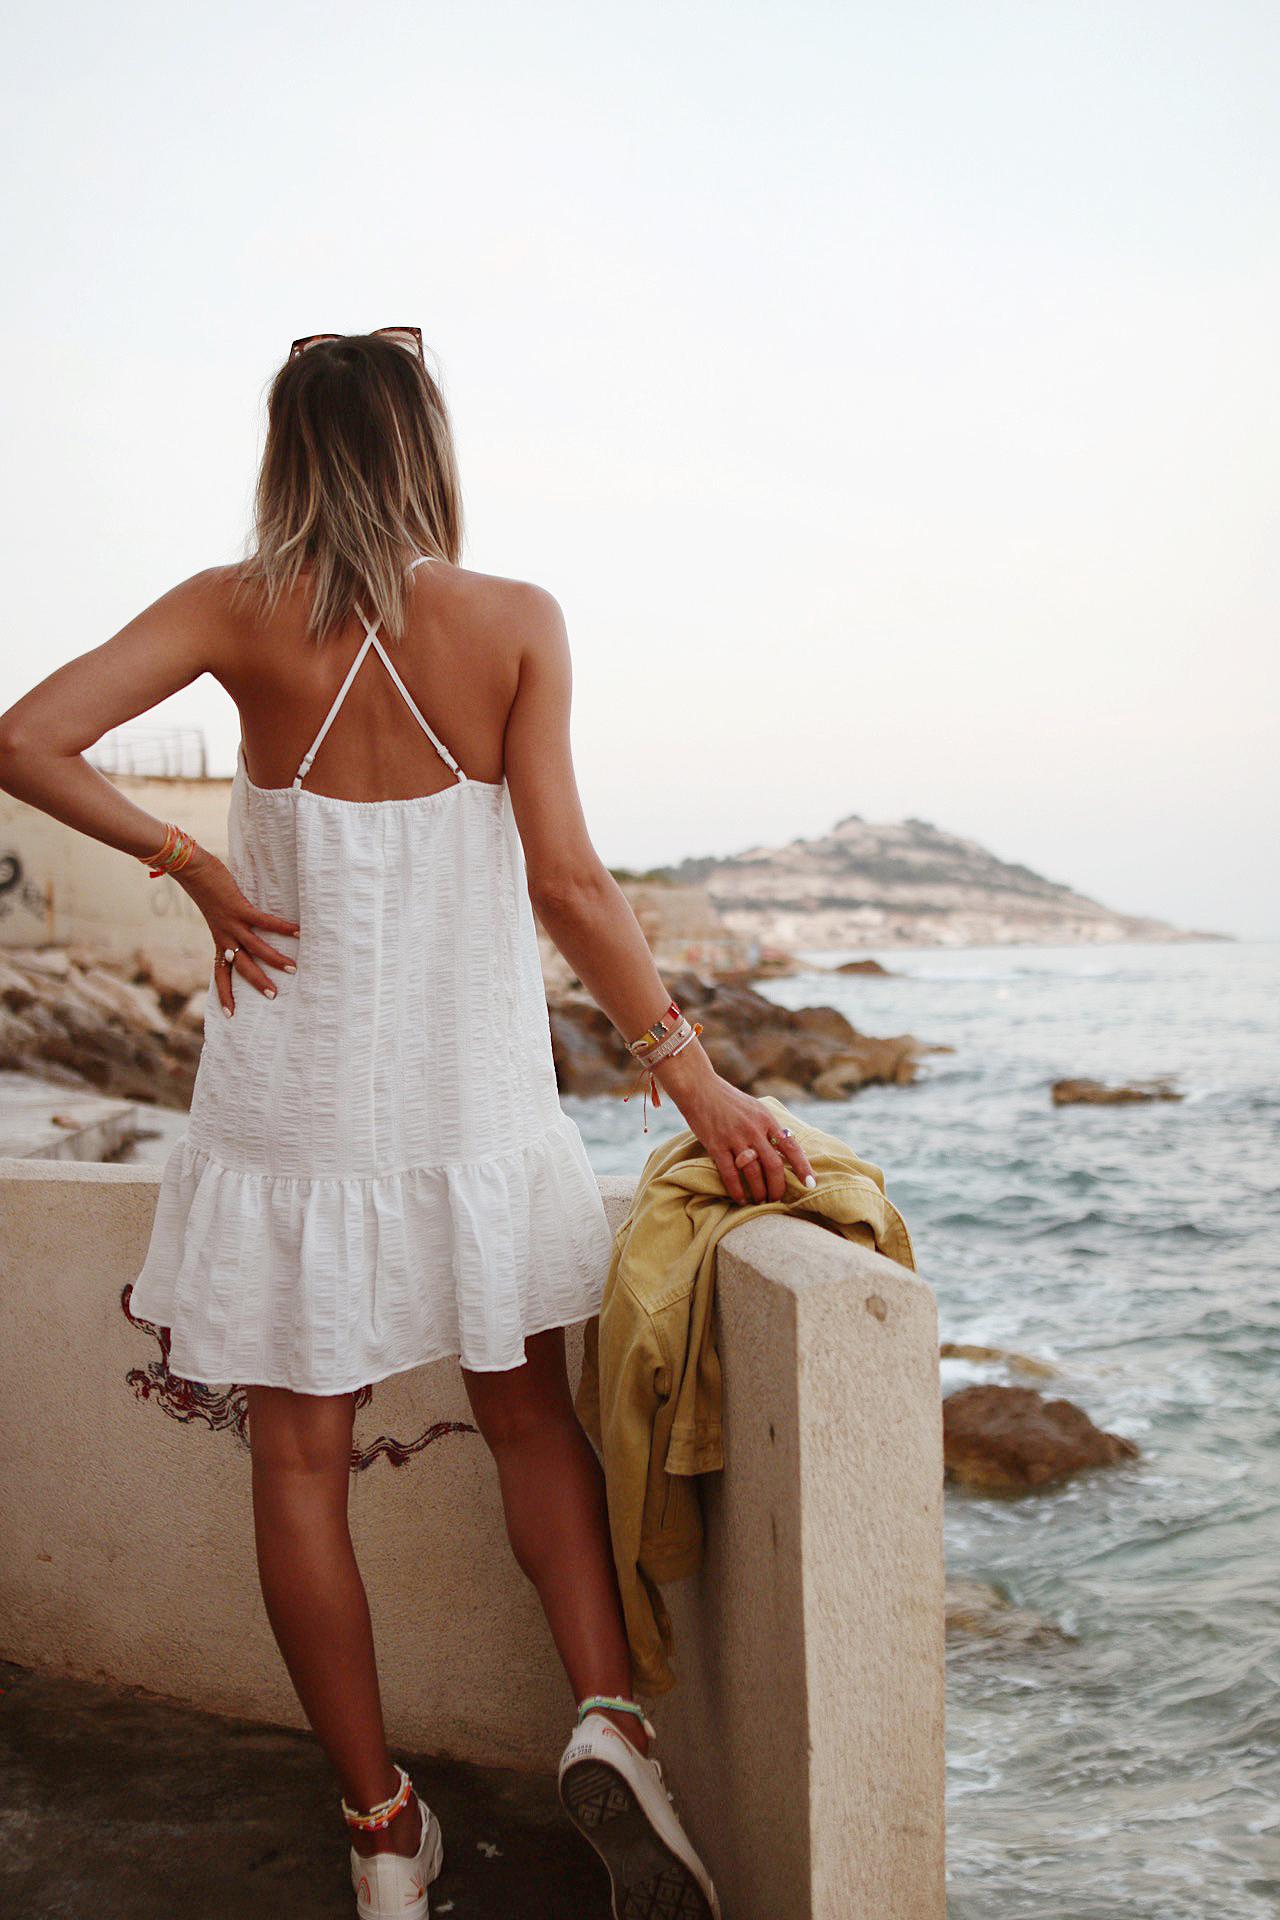 WWW.CHONANDCHON.COM petite robe blanche converse arc en ciel